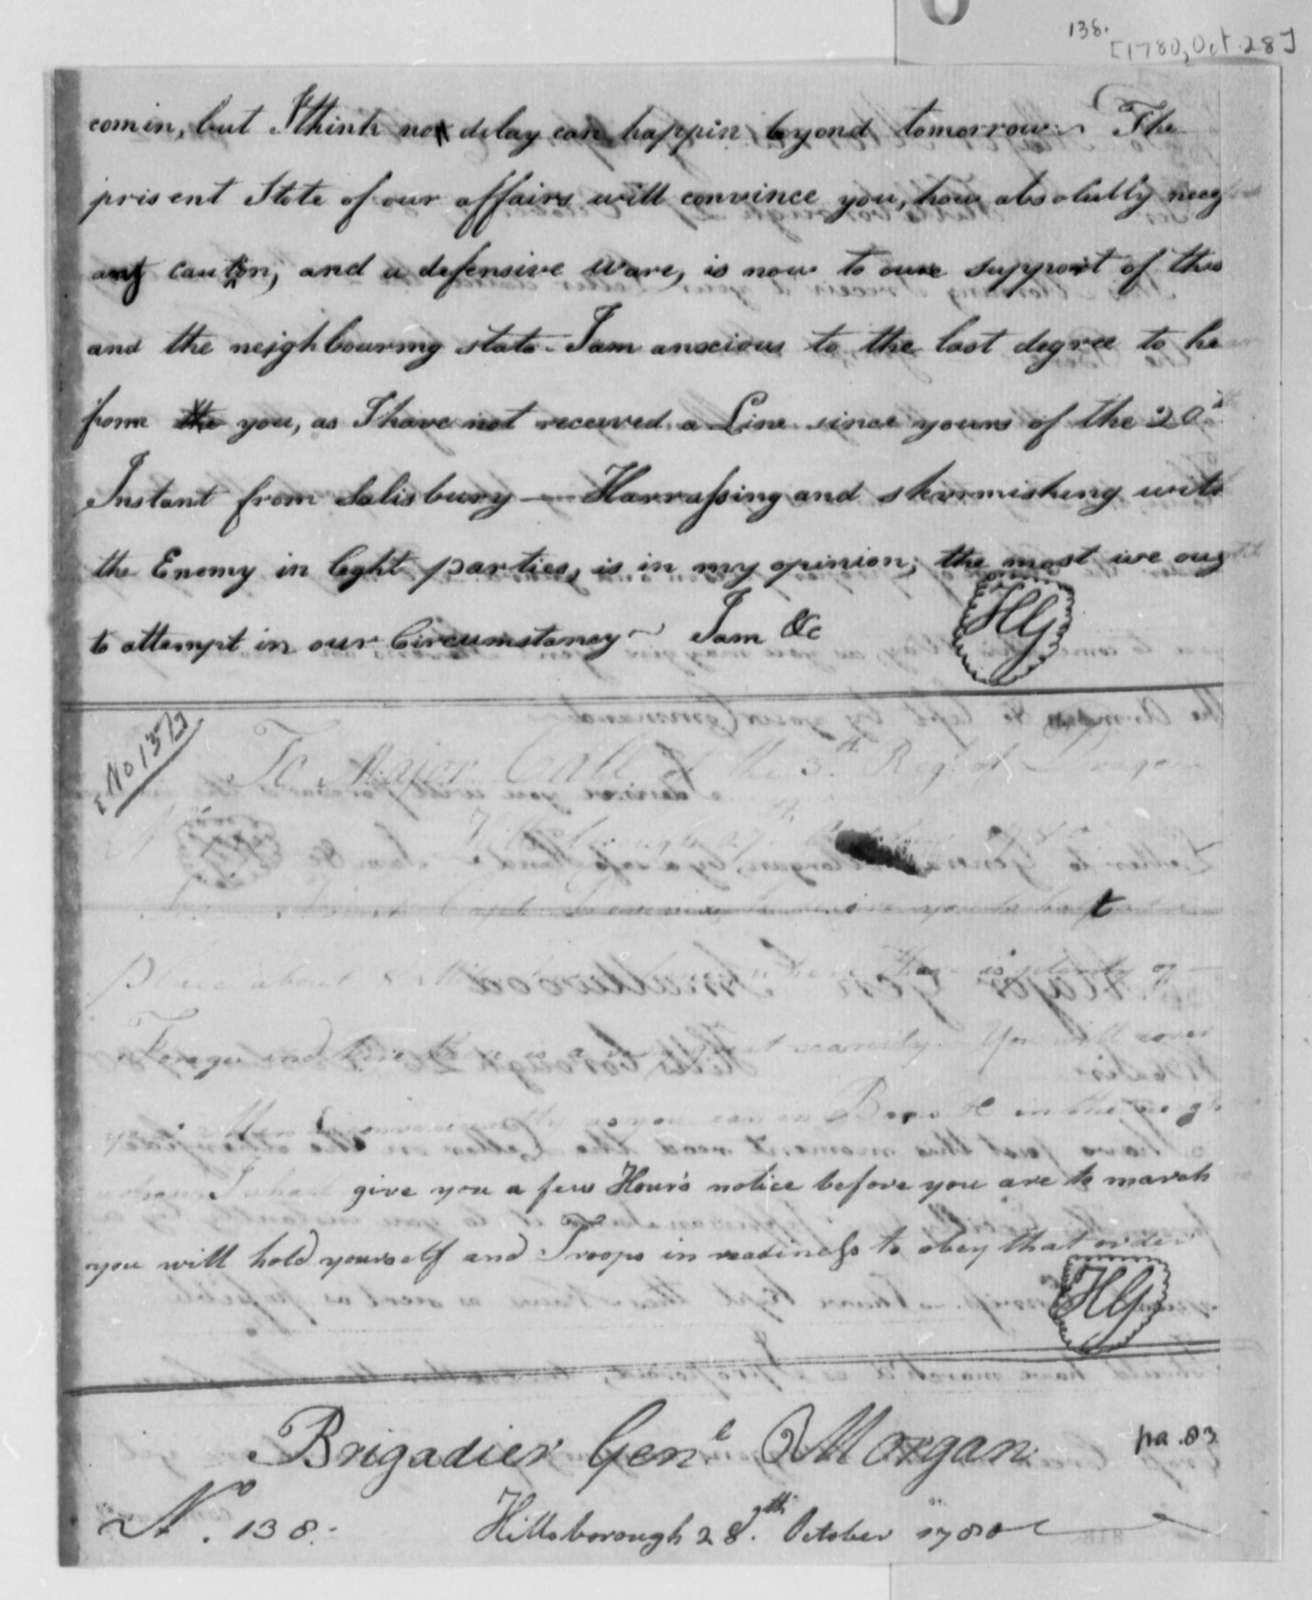 Horatio Gates to Richard K. Call, October 27, 1780